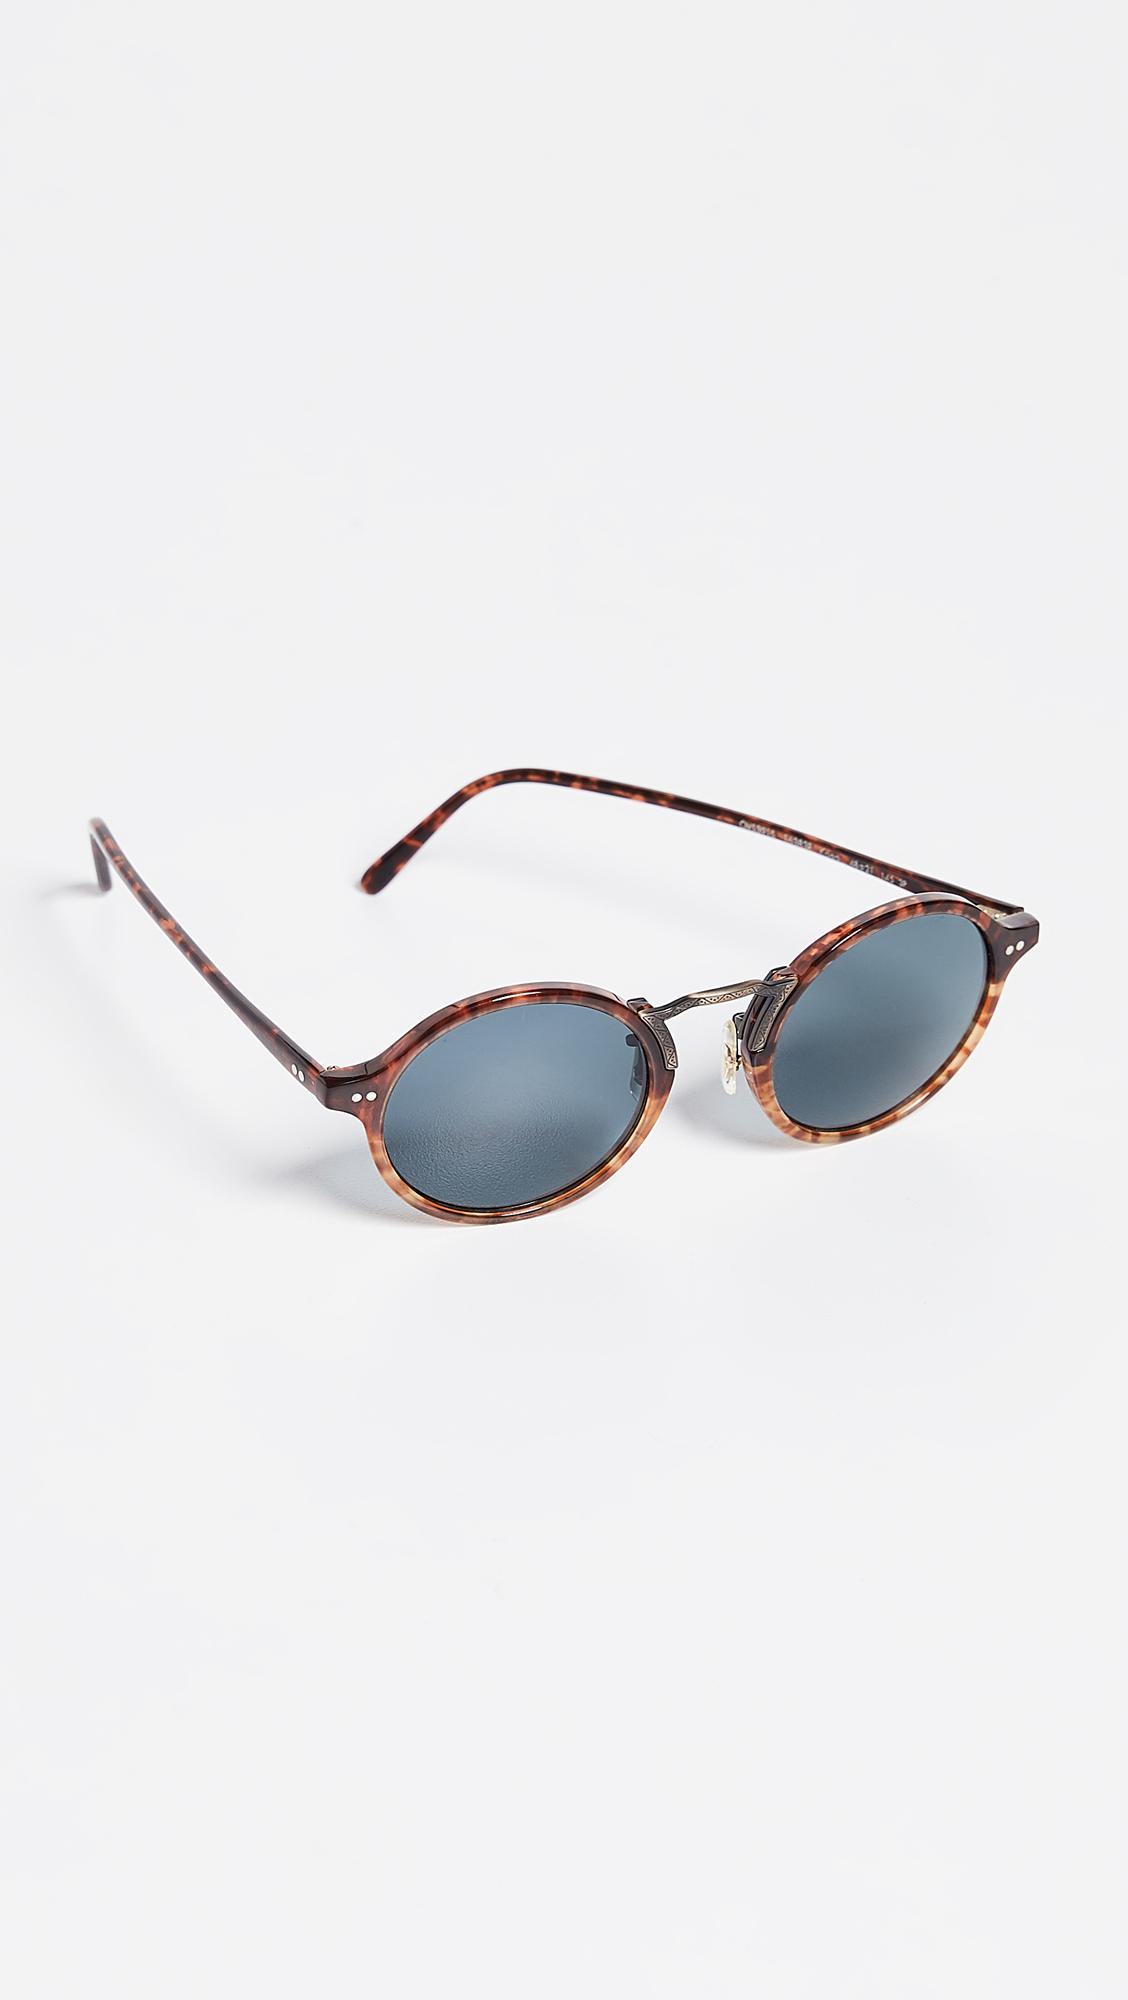 5330c9b51c6 Oliver Peoples - Blue Kosa Sunglasses for Men - Lyst. View fullscreen